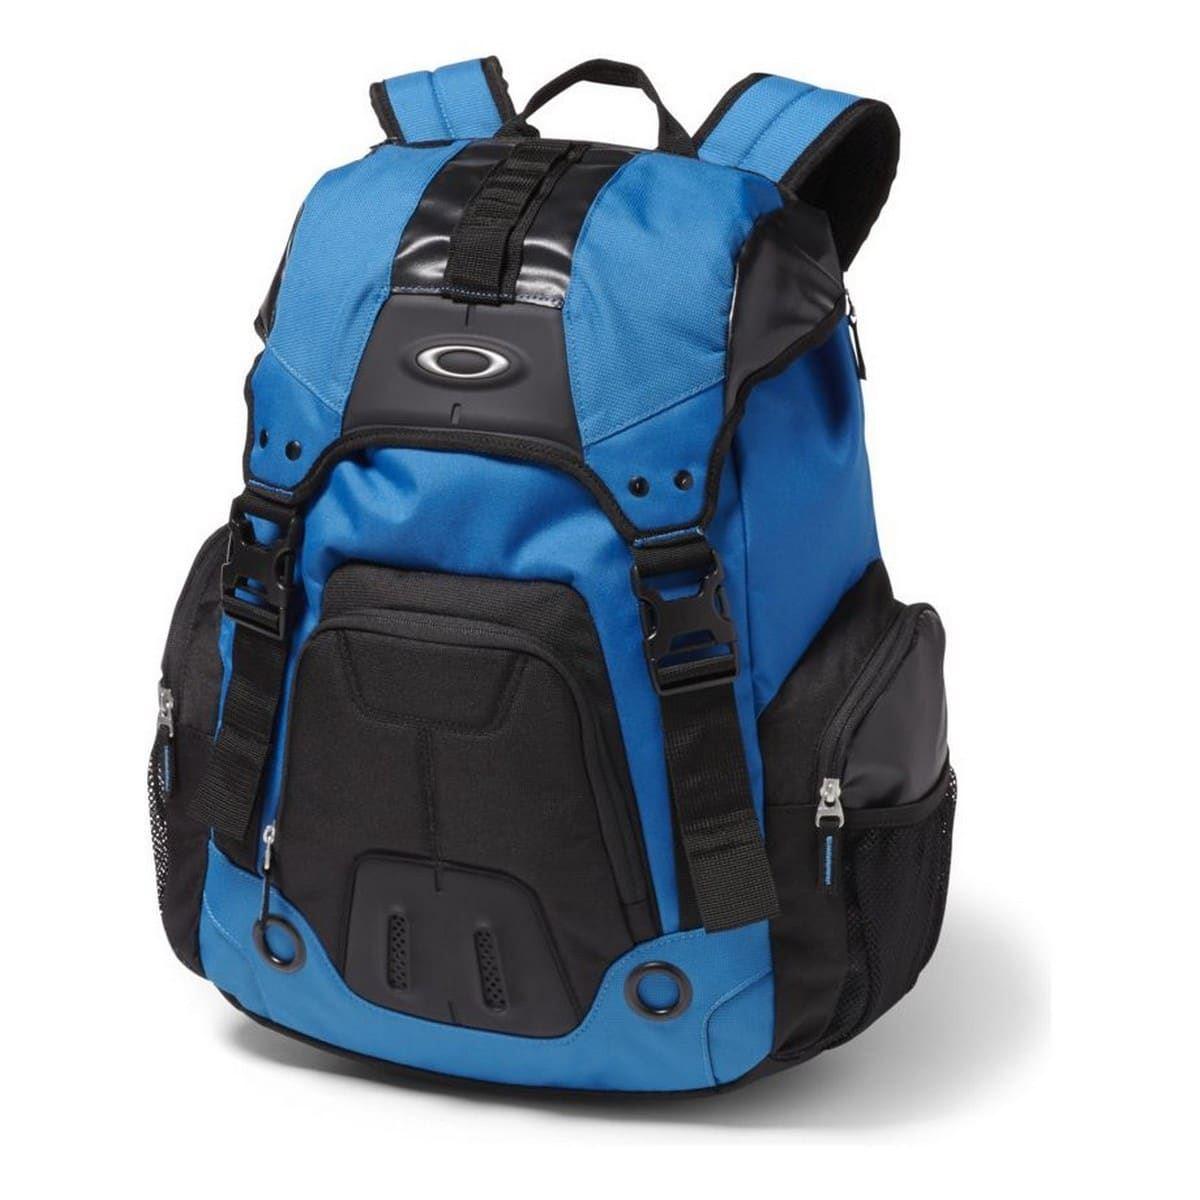 Oakley - Mochila Gearbox LX - Azul Claro | Juntoz.com